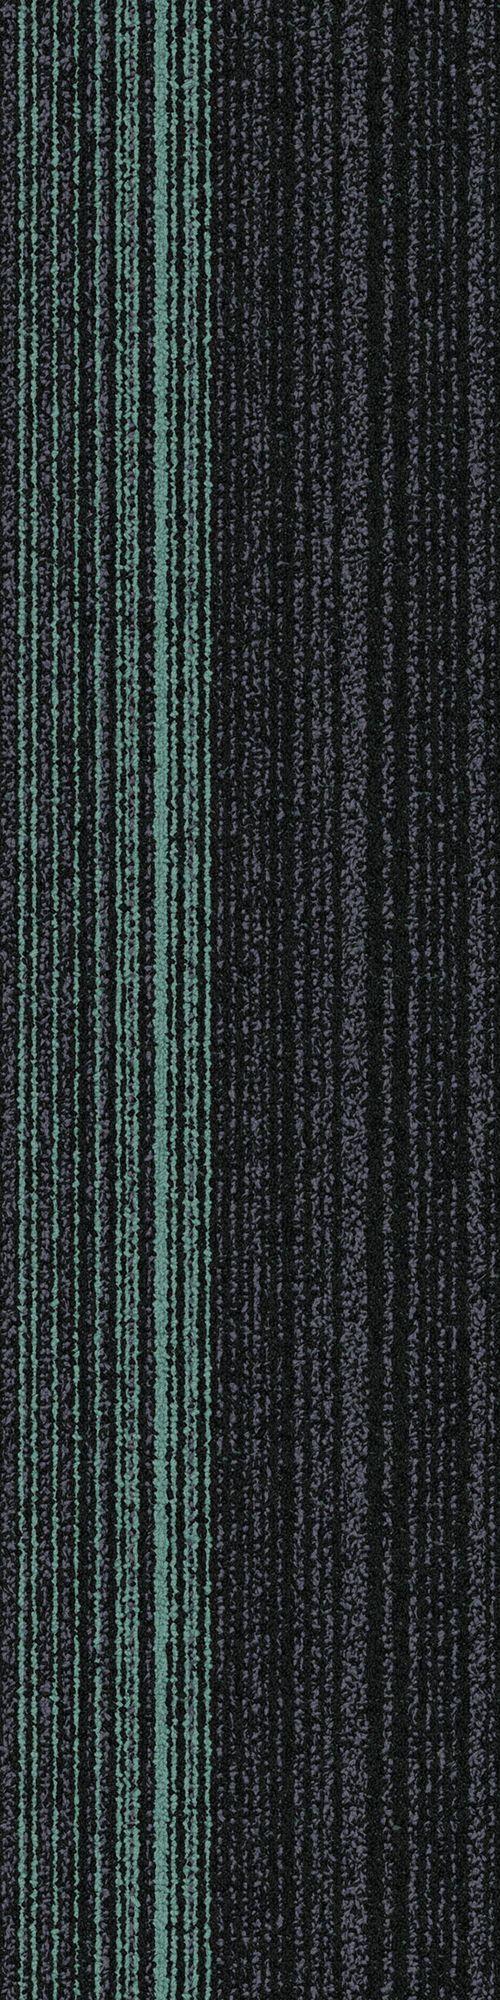 17 best bike path by interface images on pinterest paths carpet interface carpet tile bp411 color name licoriceteal variant 6 baanklon Gallery